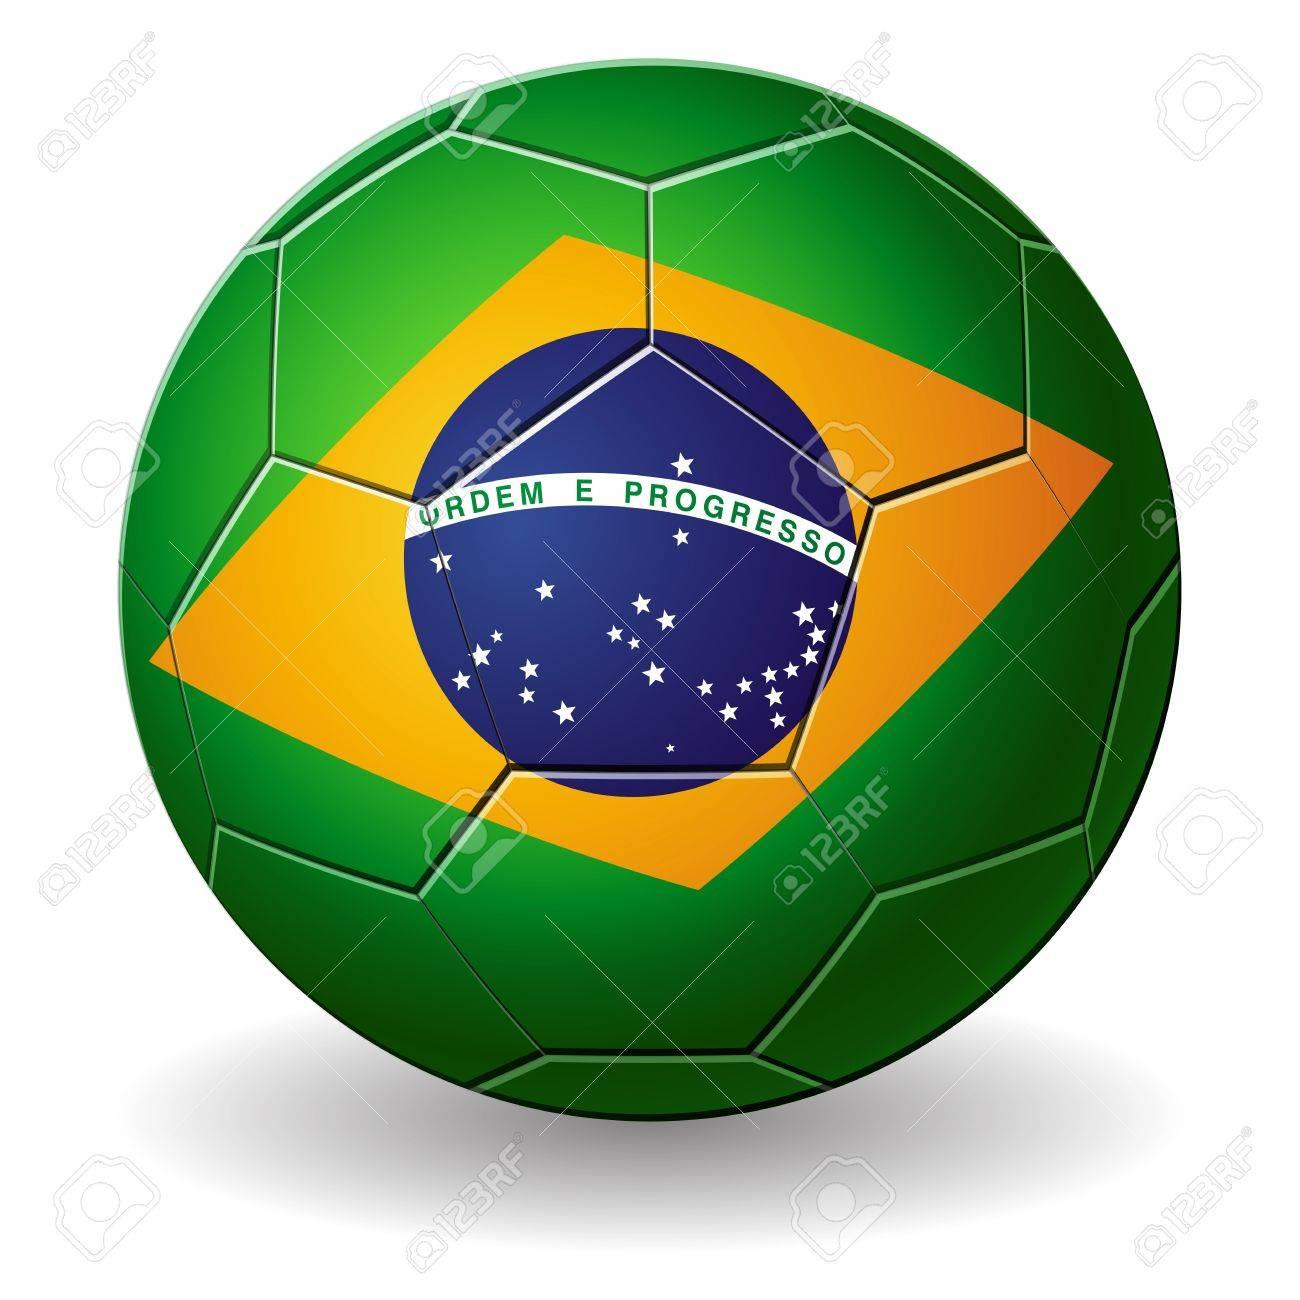 de4e6bfe1 Design of a Brazilian soccer ball isolated on a white background Stock  Vector - 13986691